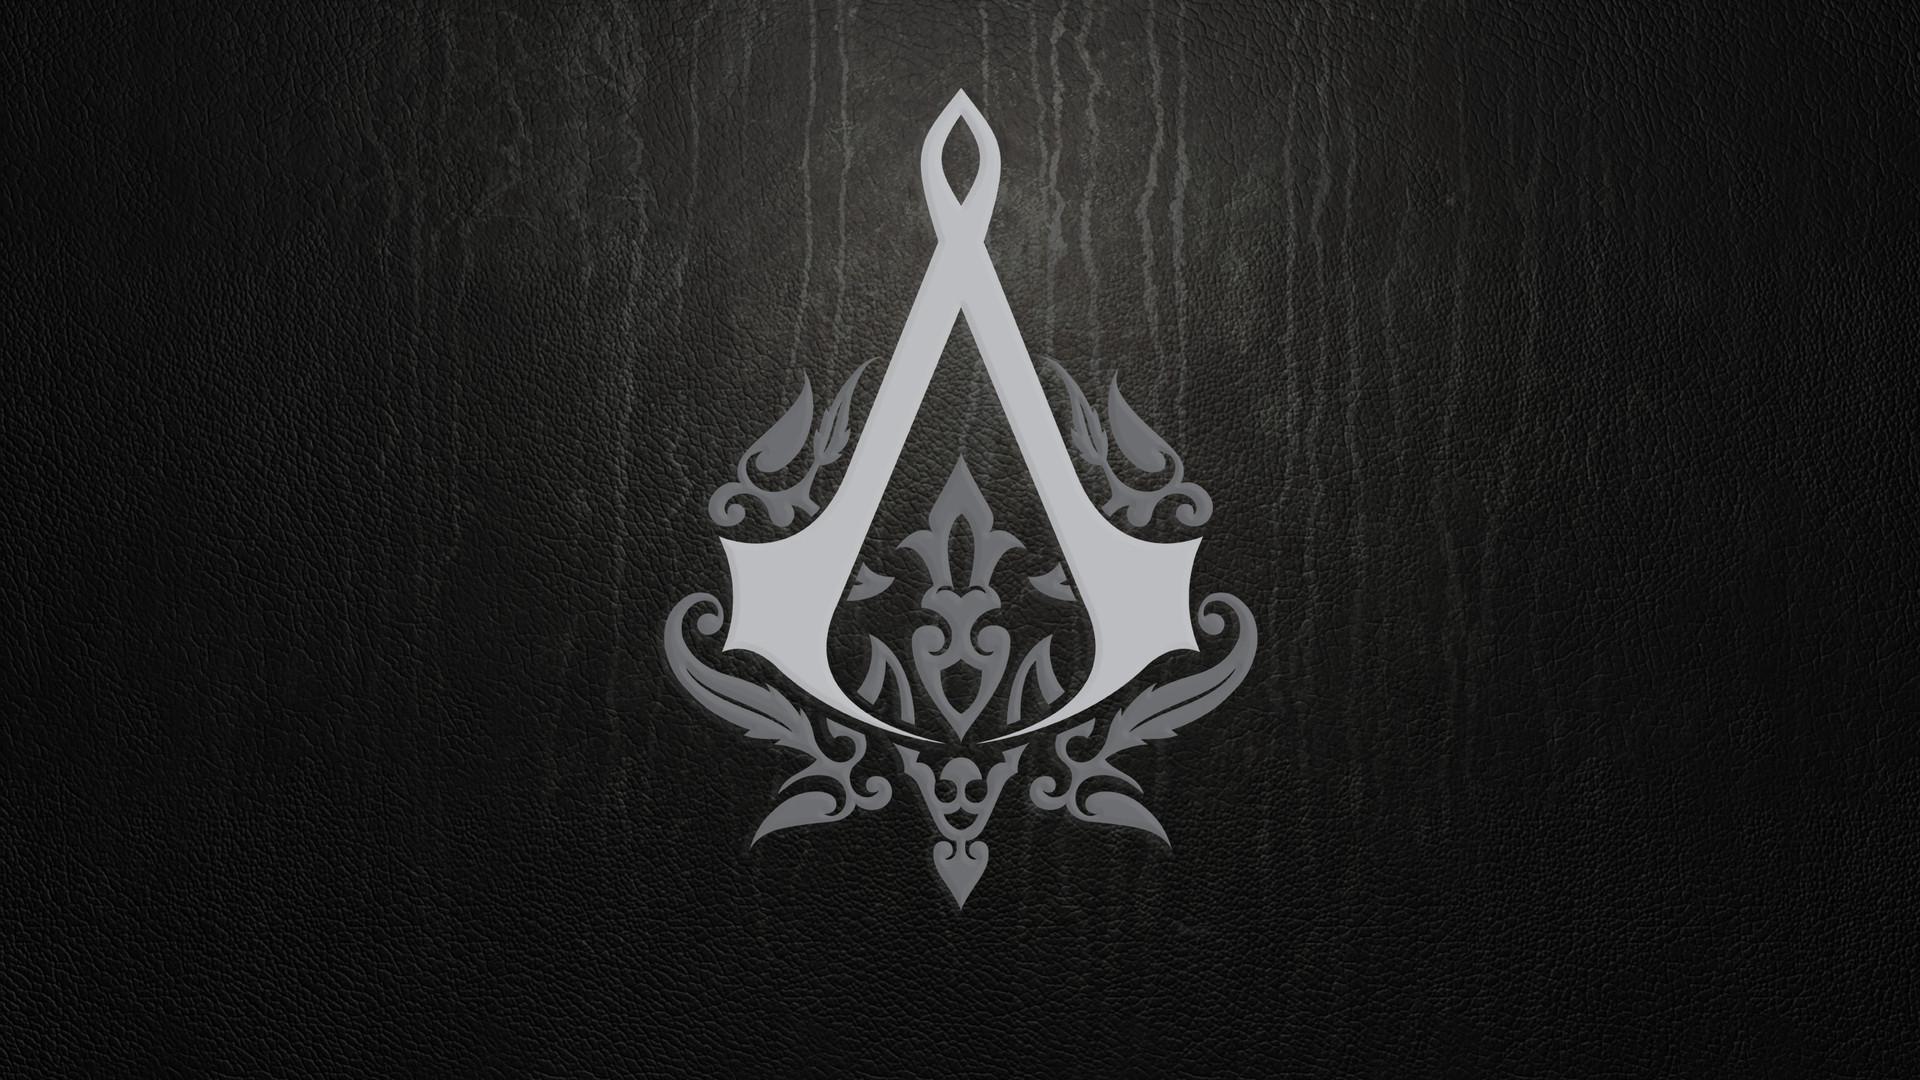 Logo HD Wallpapers Backgrounds Wallpaper